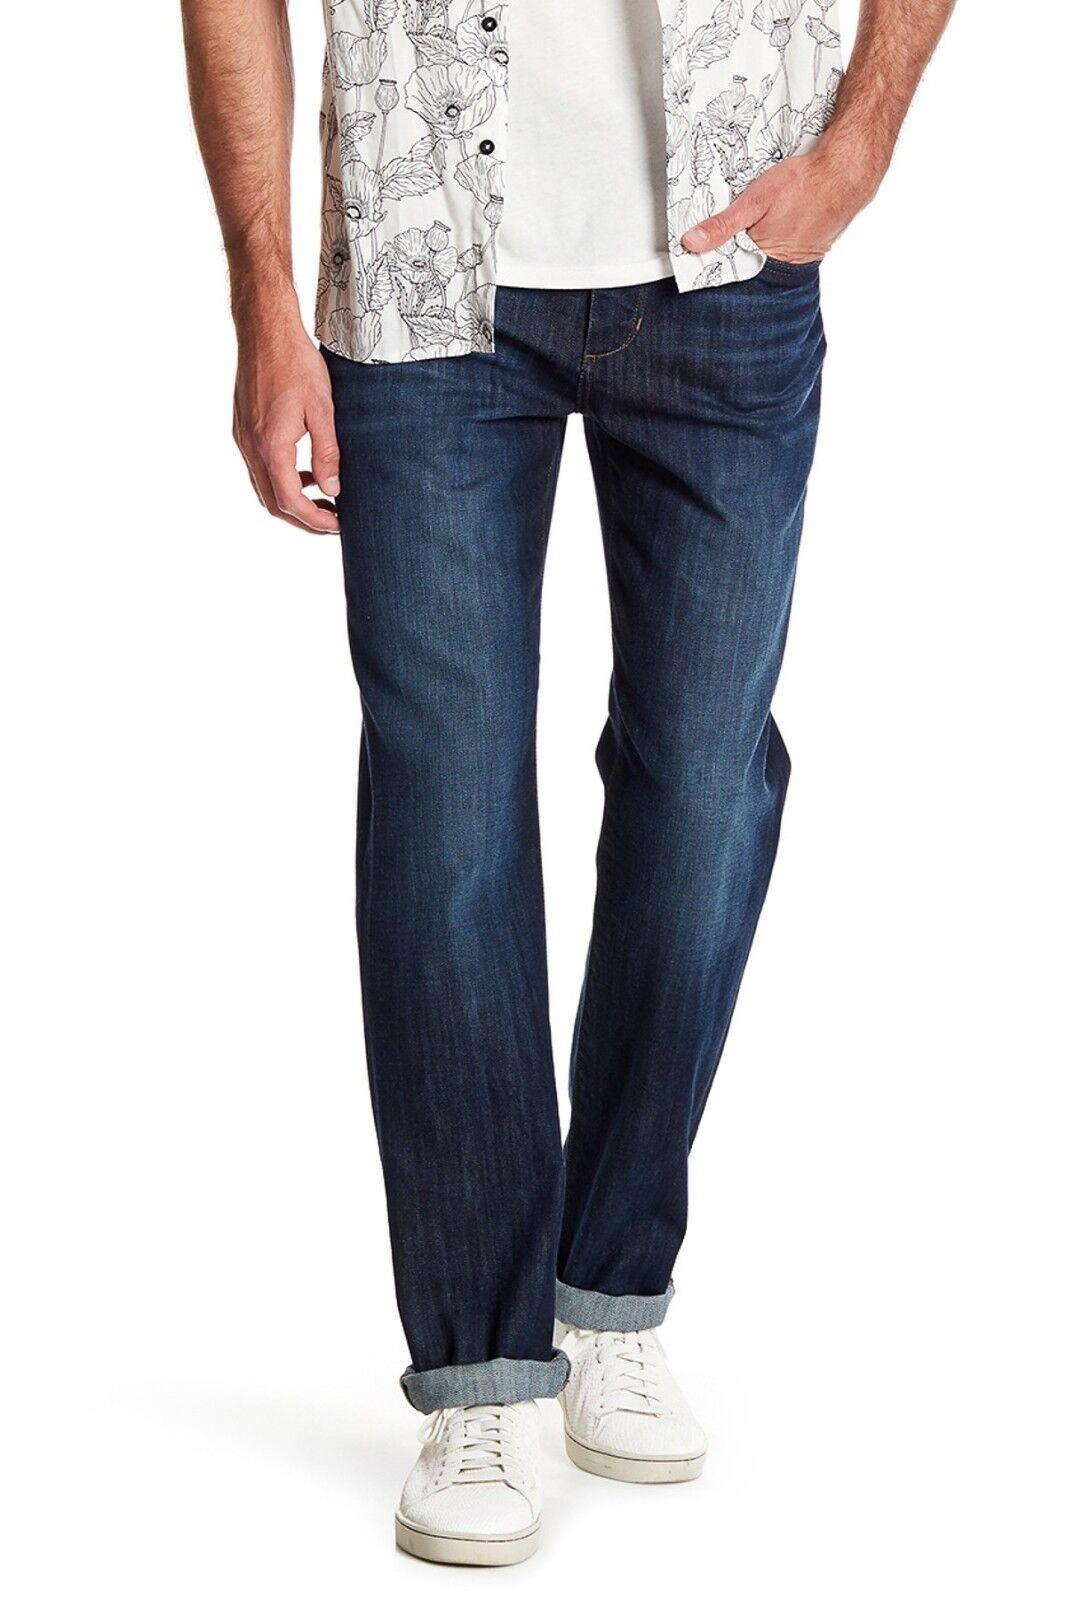 Joe's Jeans Brixton Straight and Narrow Jeans Denim Pants Matisse 34 36 38